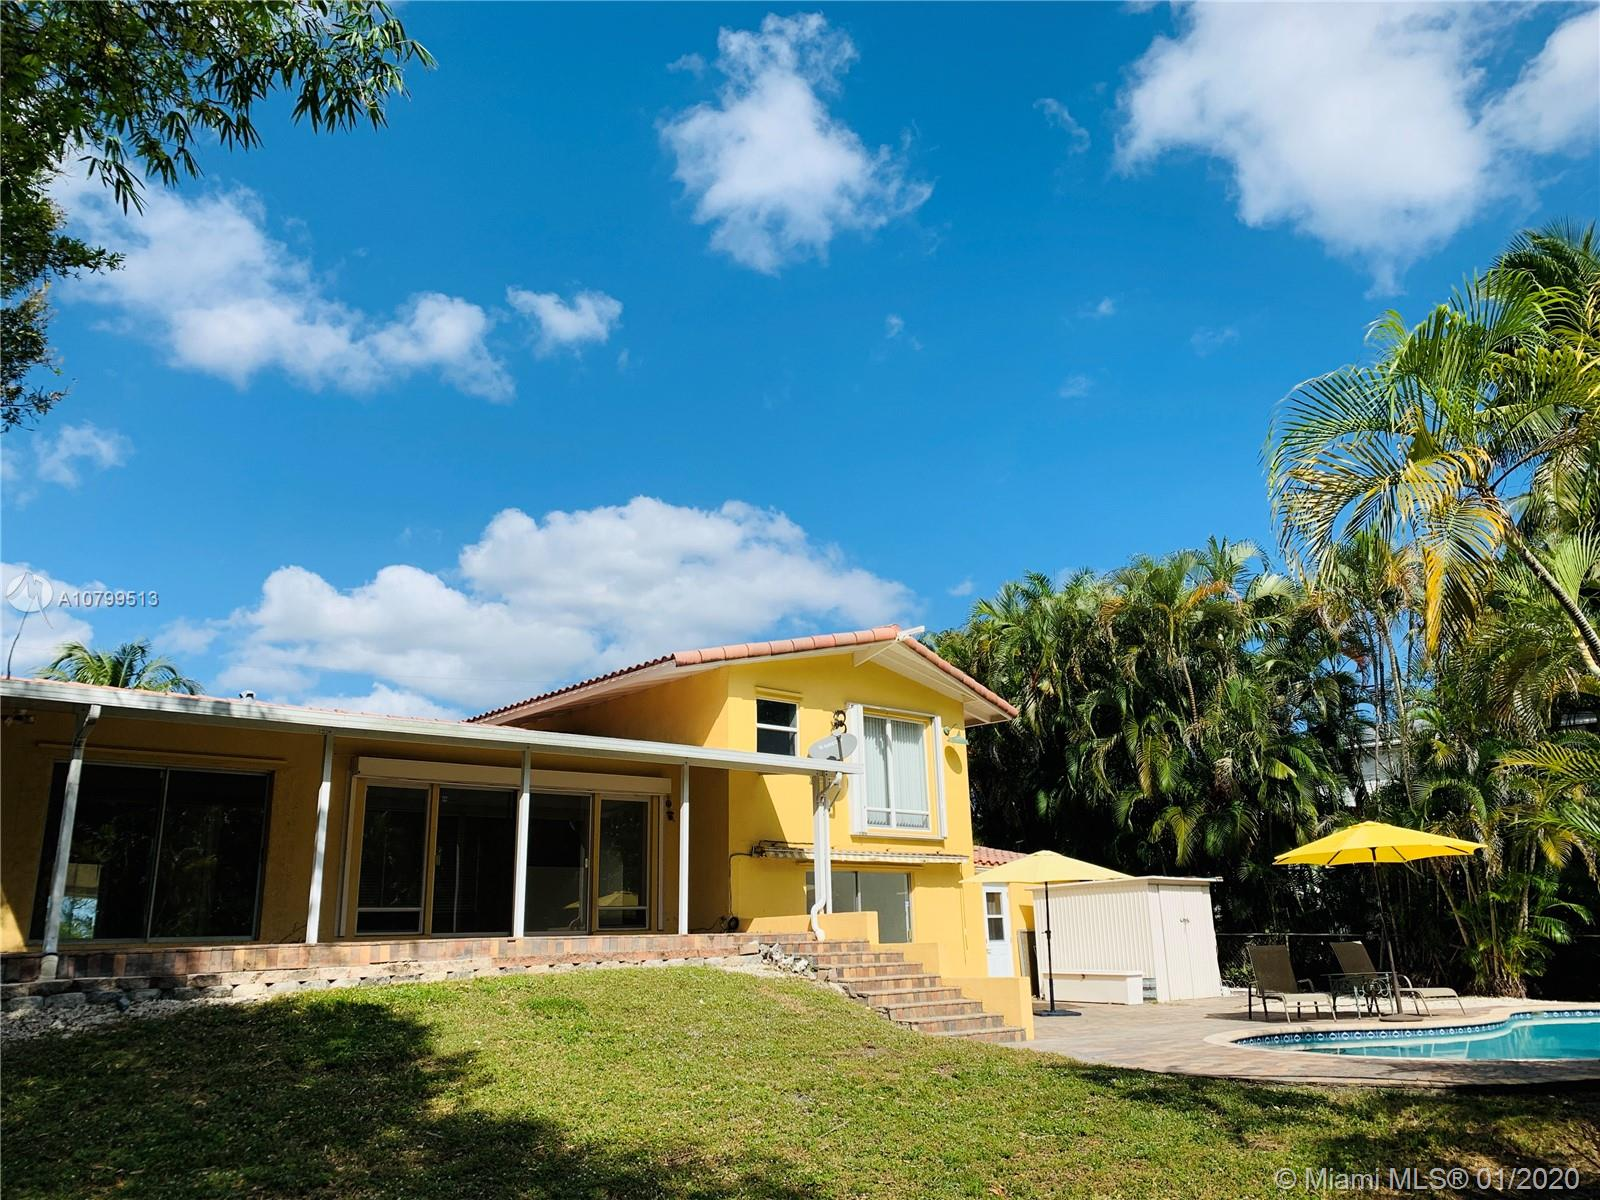 1508 SW 5th Ct, Fort Lauderdale, FL 33312